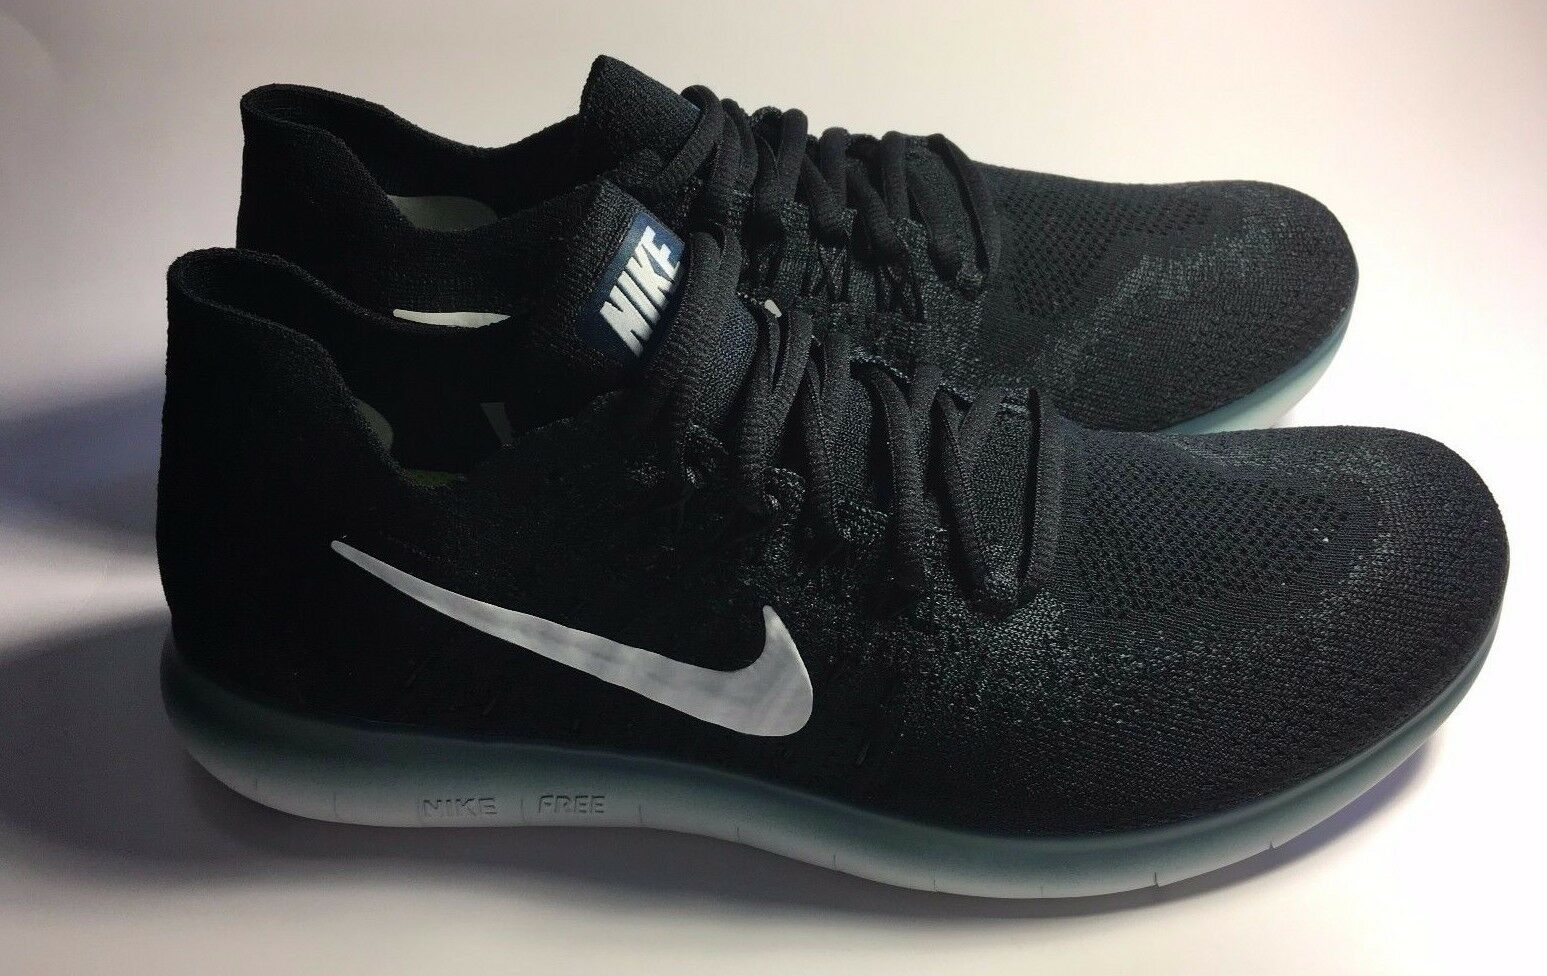 Nike Men's Free RN Flyknit  Running Cross Training shoes Size 10 (CM 28)